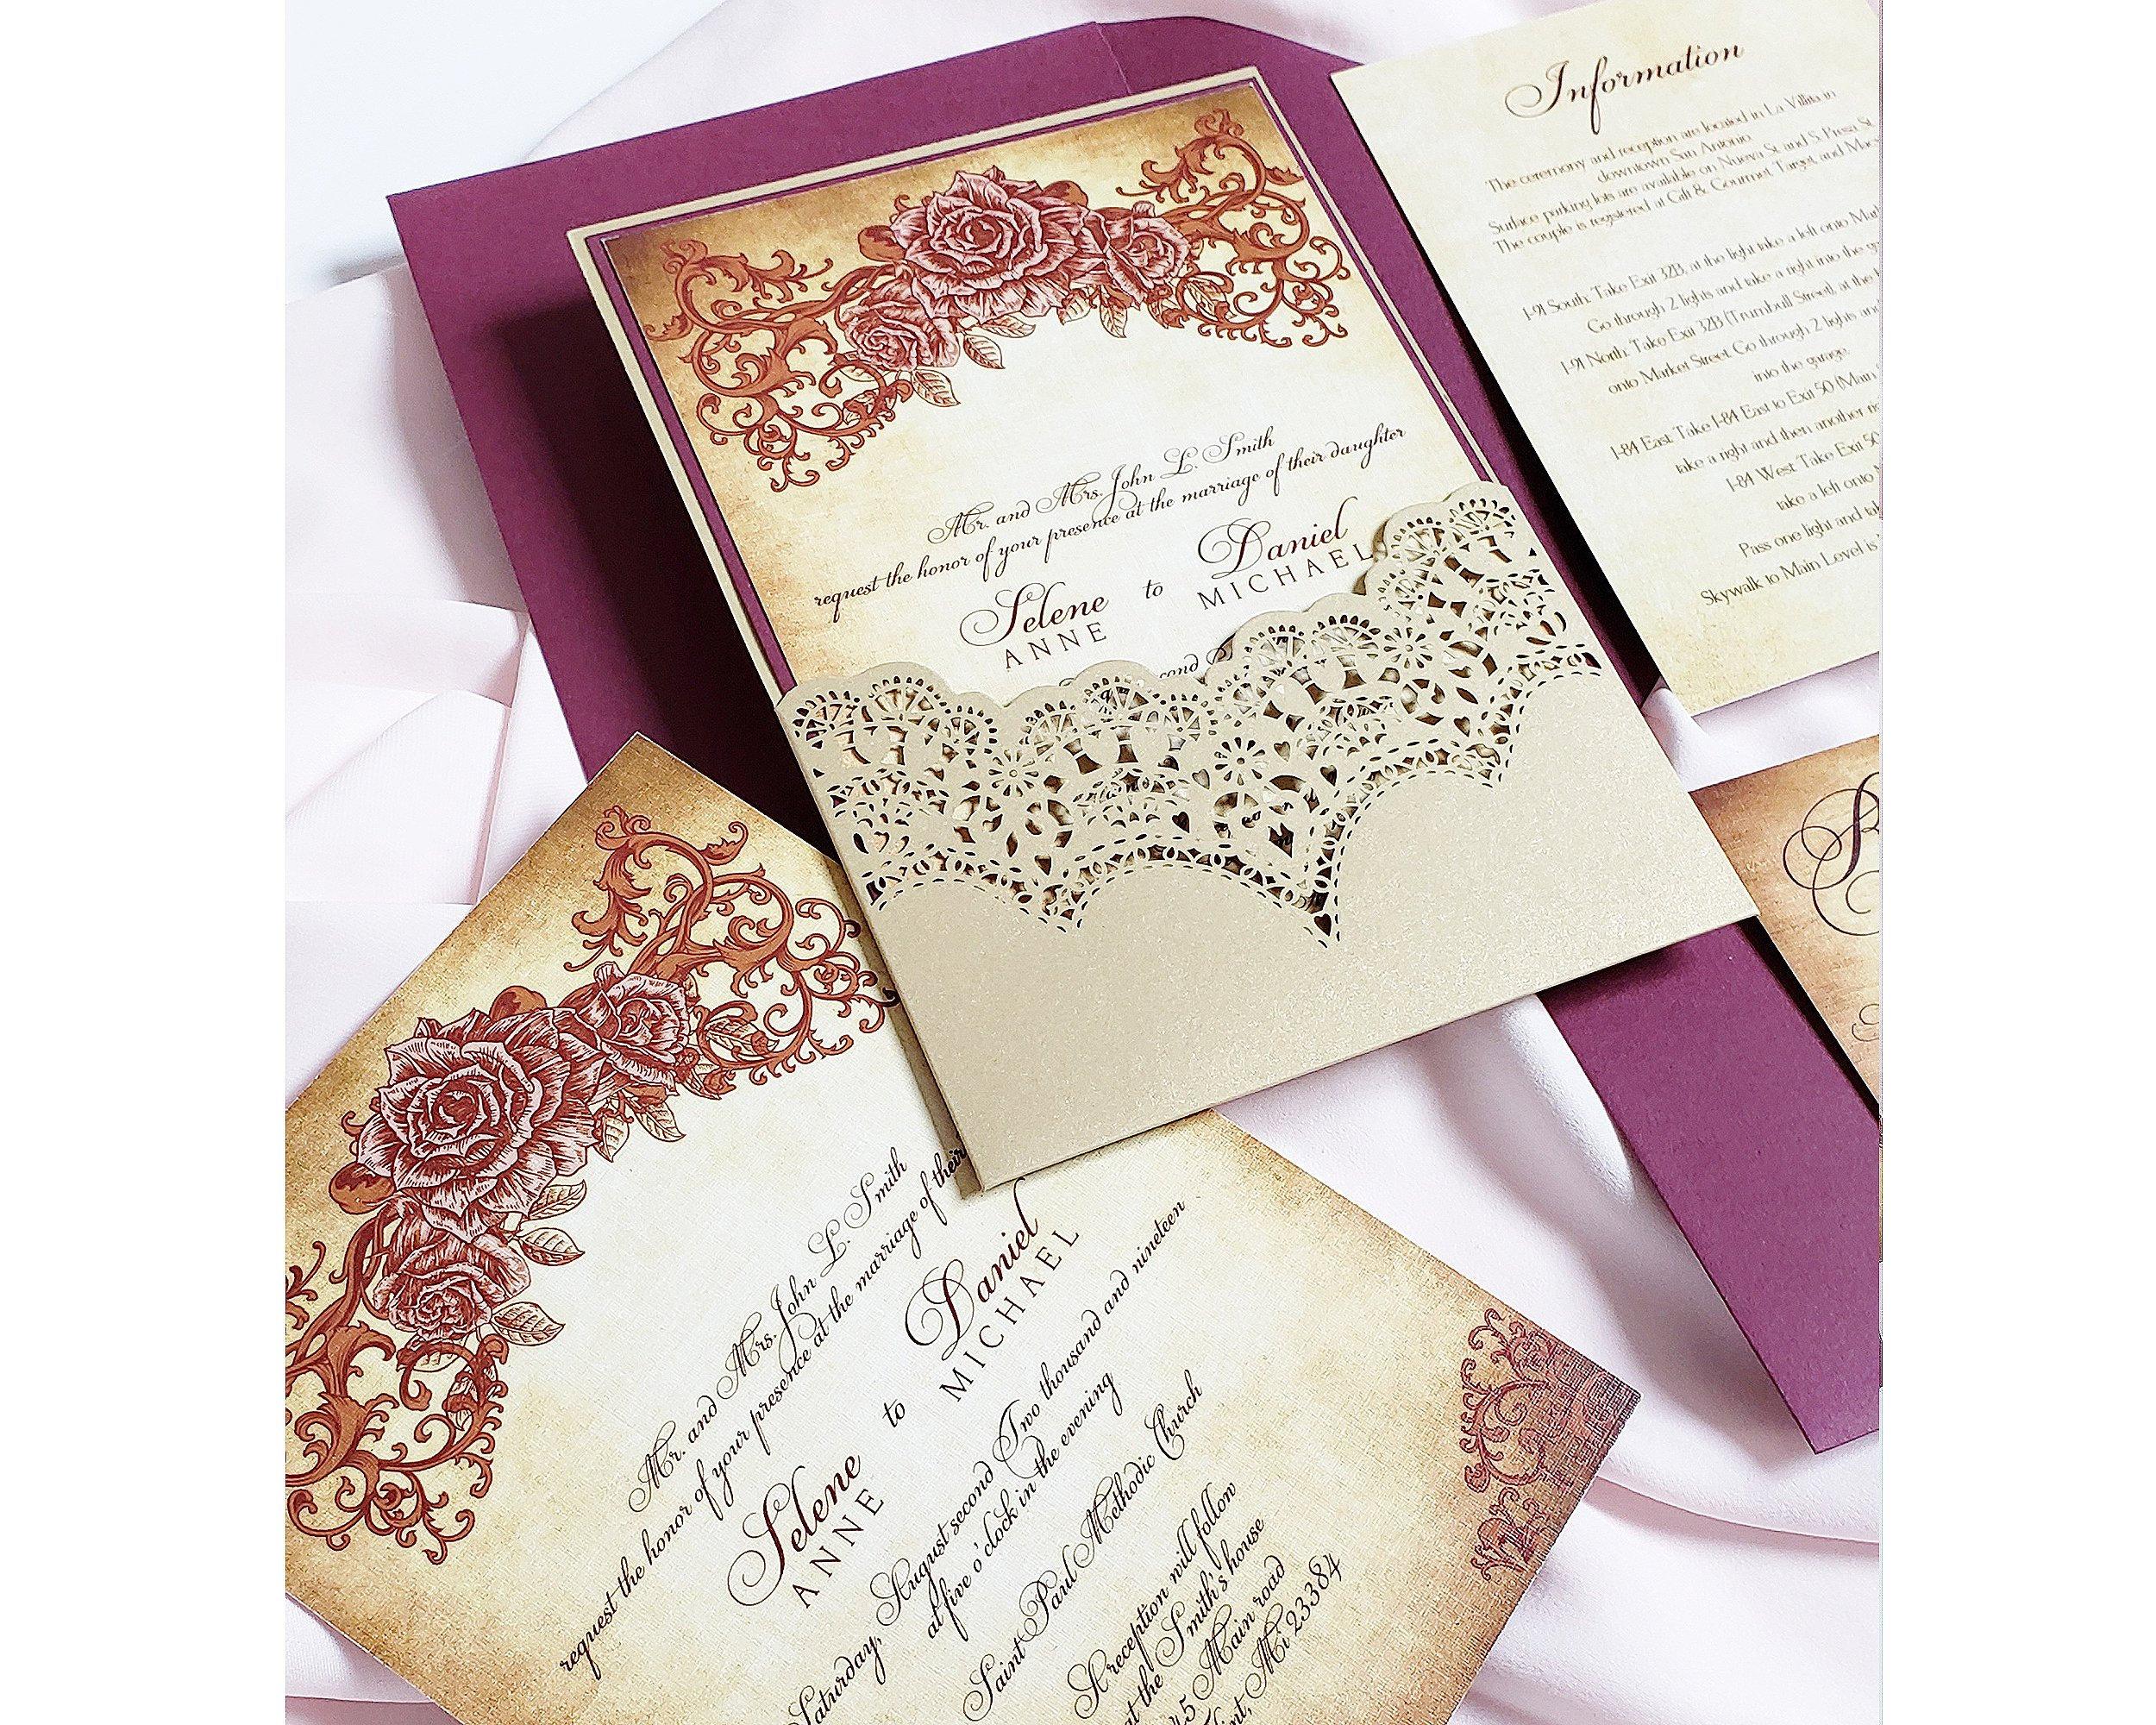 Burgundy And Gold Wedding Invitations: Vintage Burgundy Gold Wedding Invitation, Vintage Floral